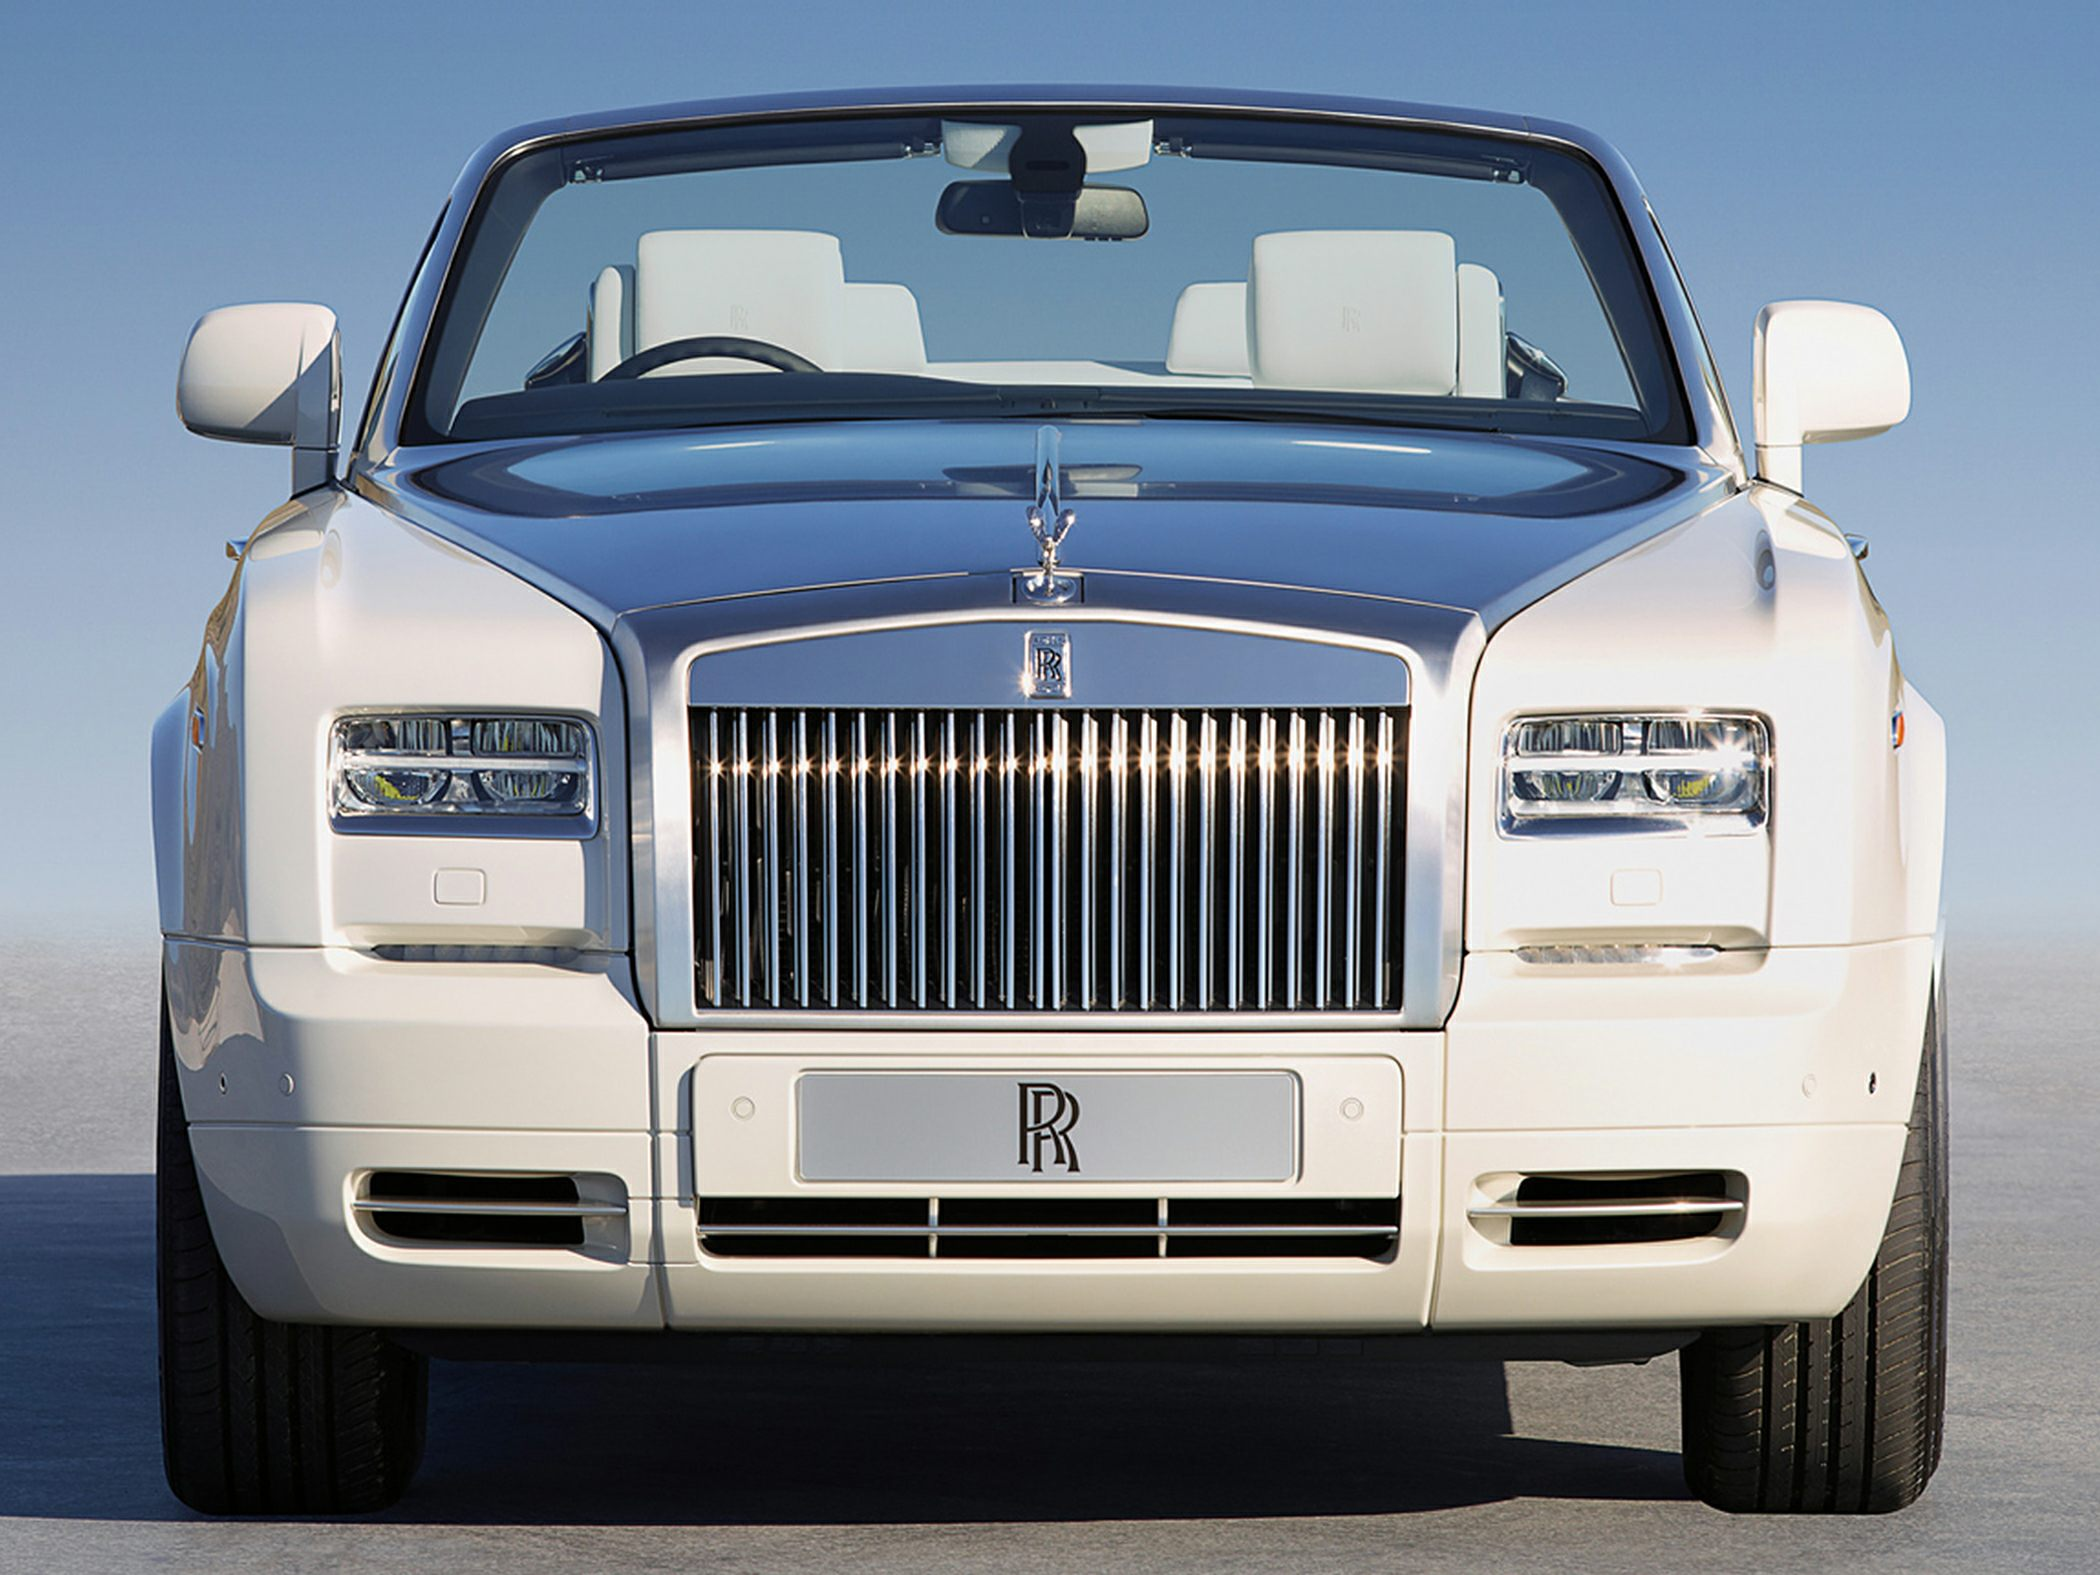 2016 Rolls Royce Phantom Drophead Coupe Photos